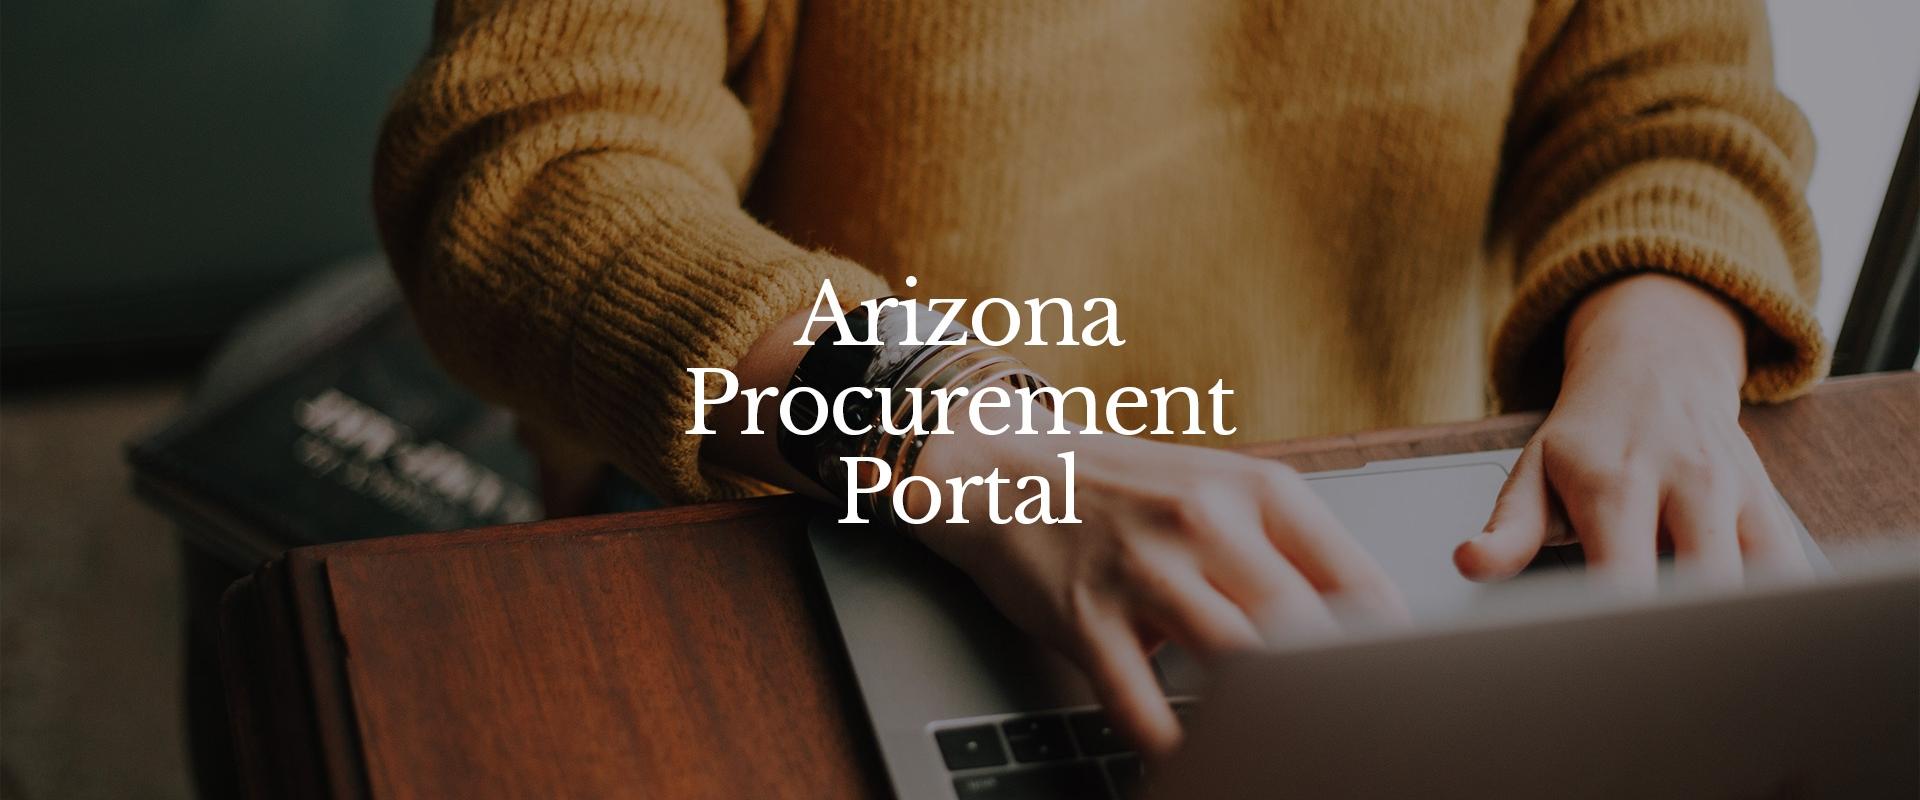 AZ Procurement Portal - Hero Image